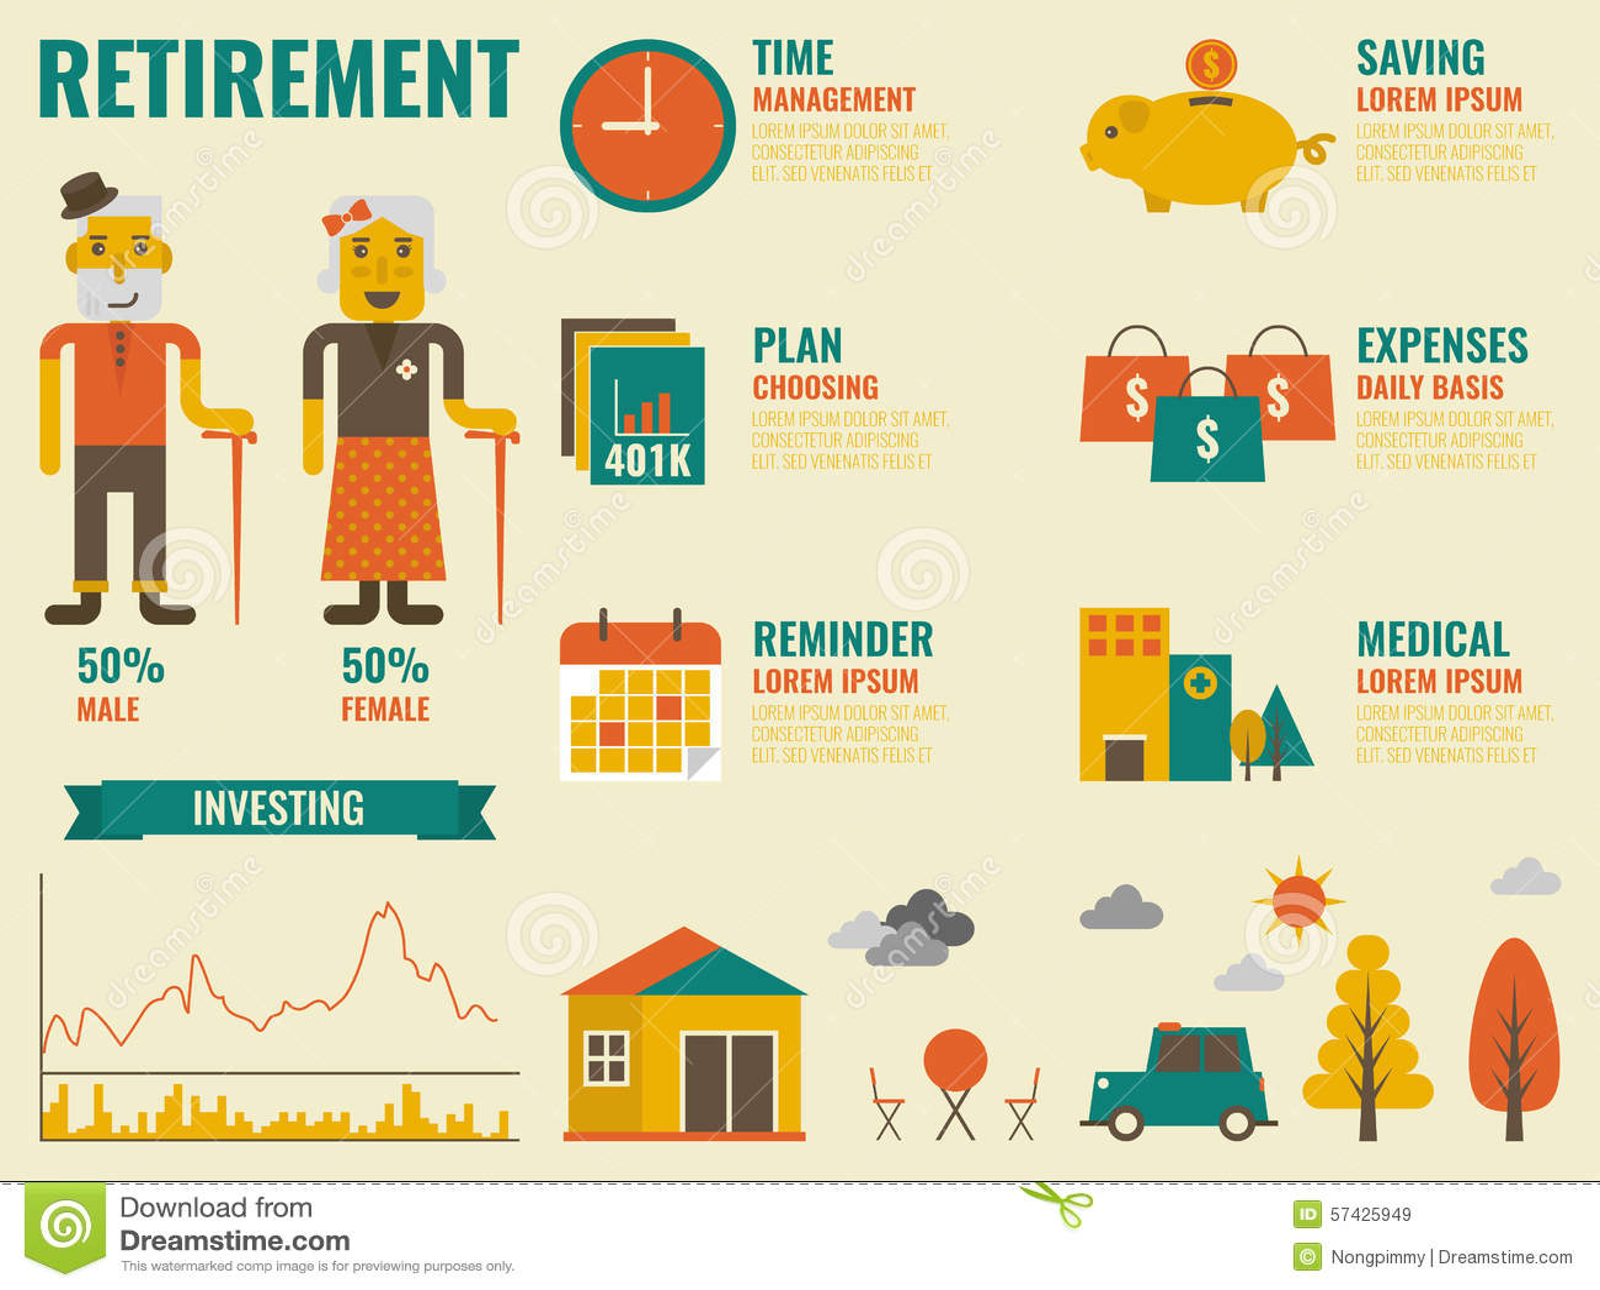 Graphic Design Pension